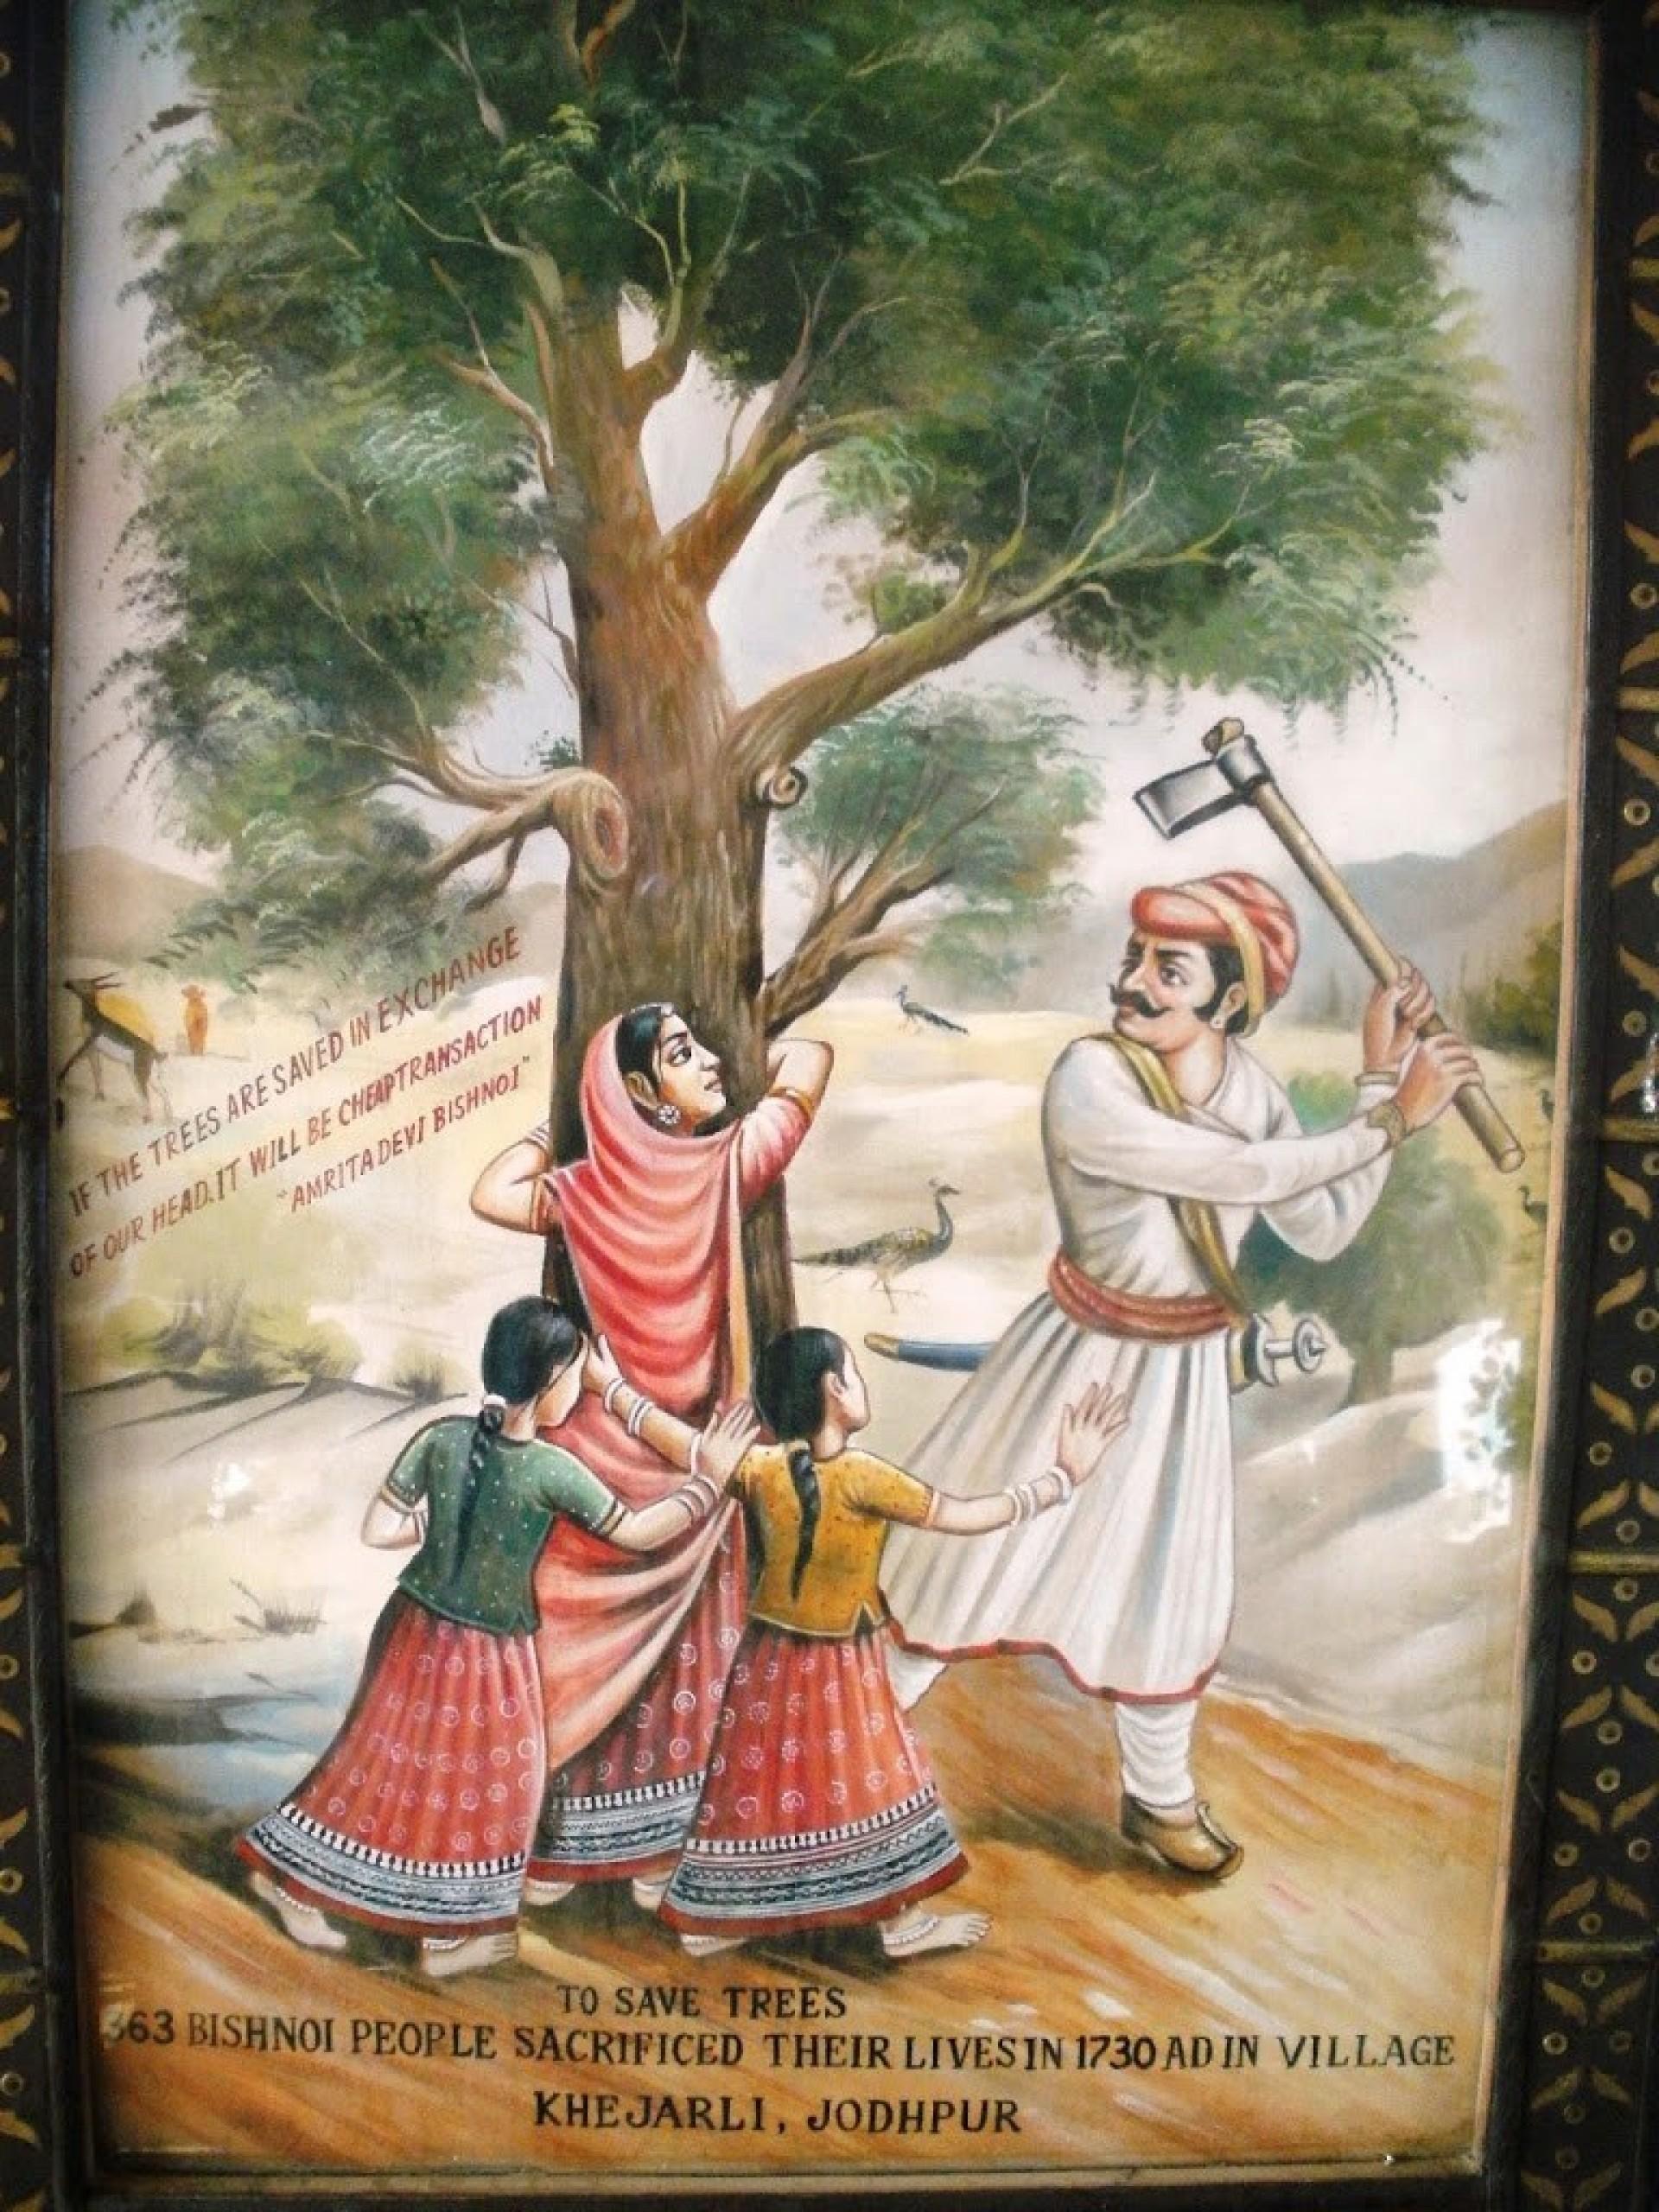 005 Essay Example Chipko Movement In Hindi Imposing Writing 150 Words Kannada Language 1920